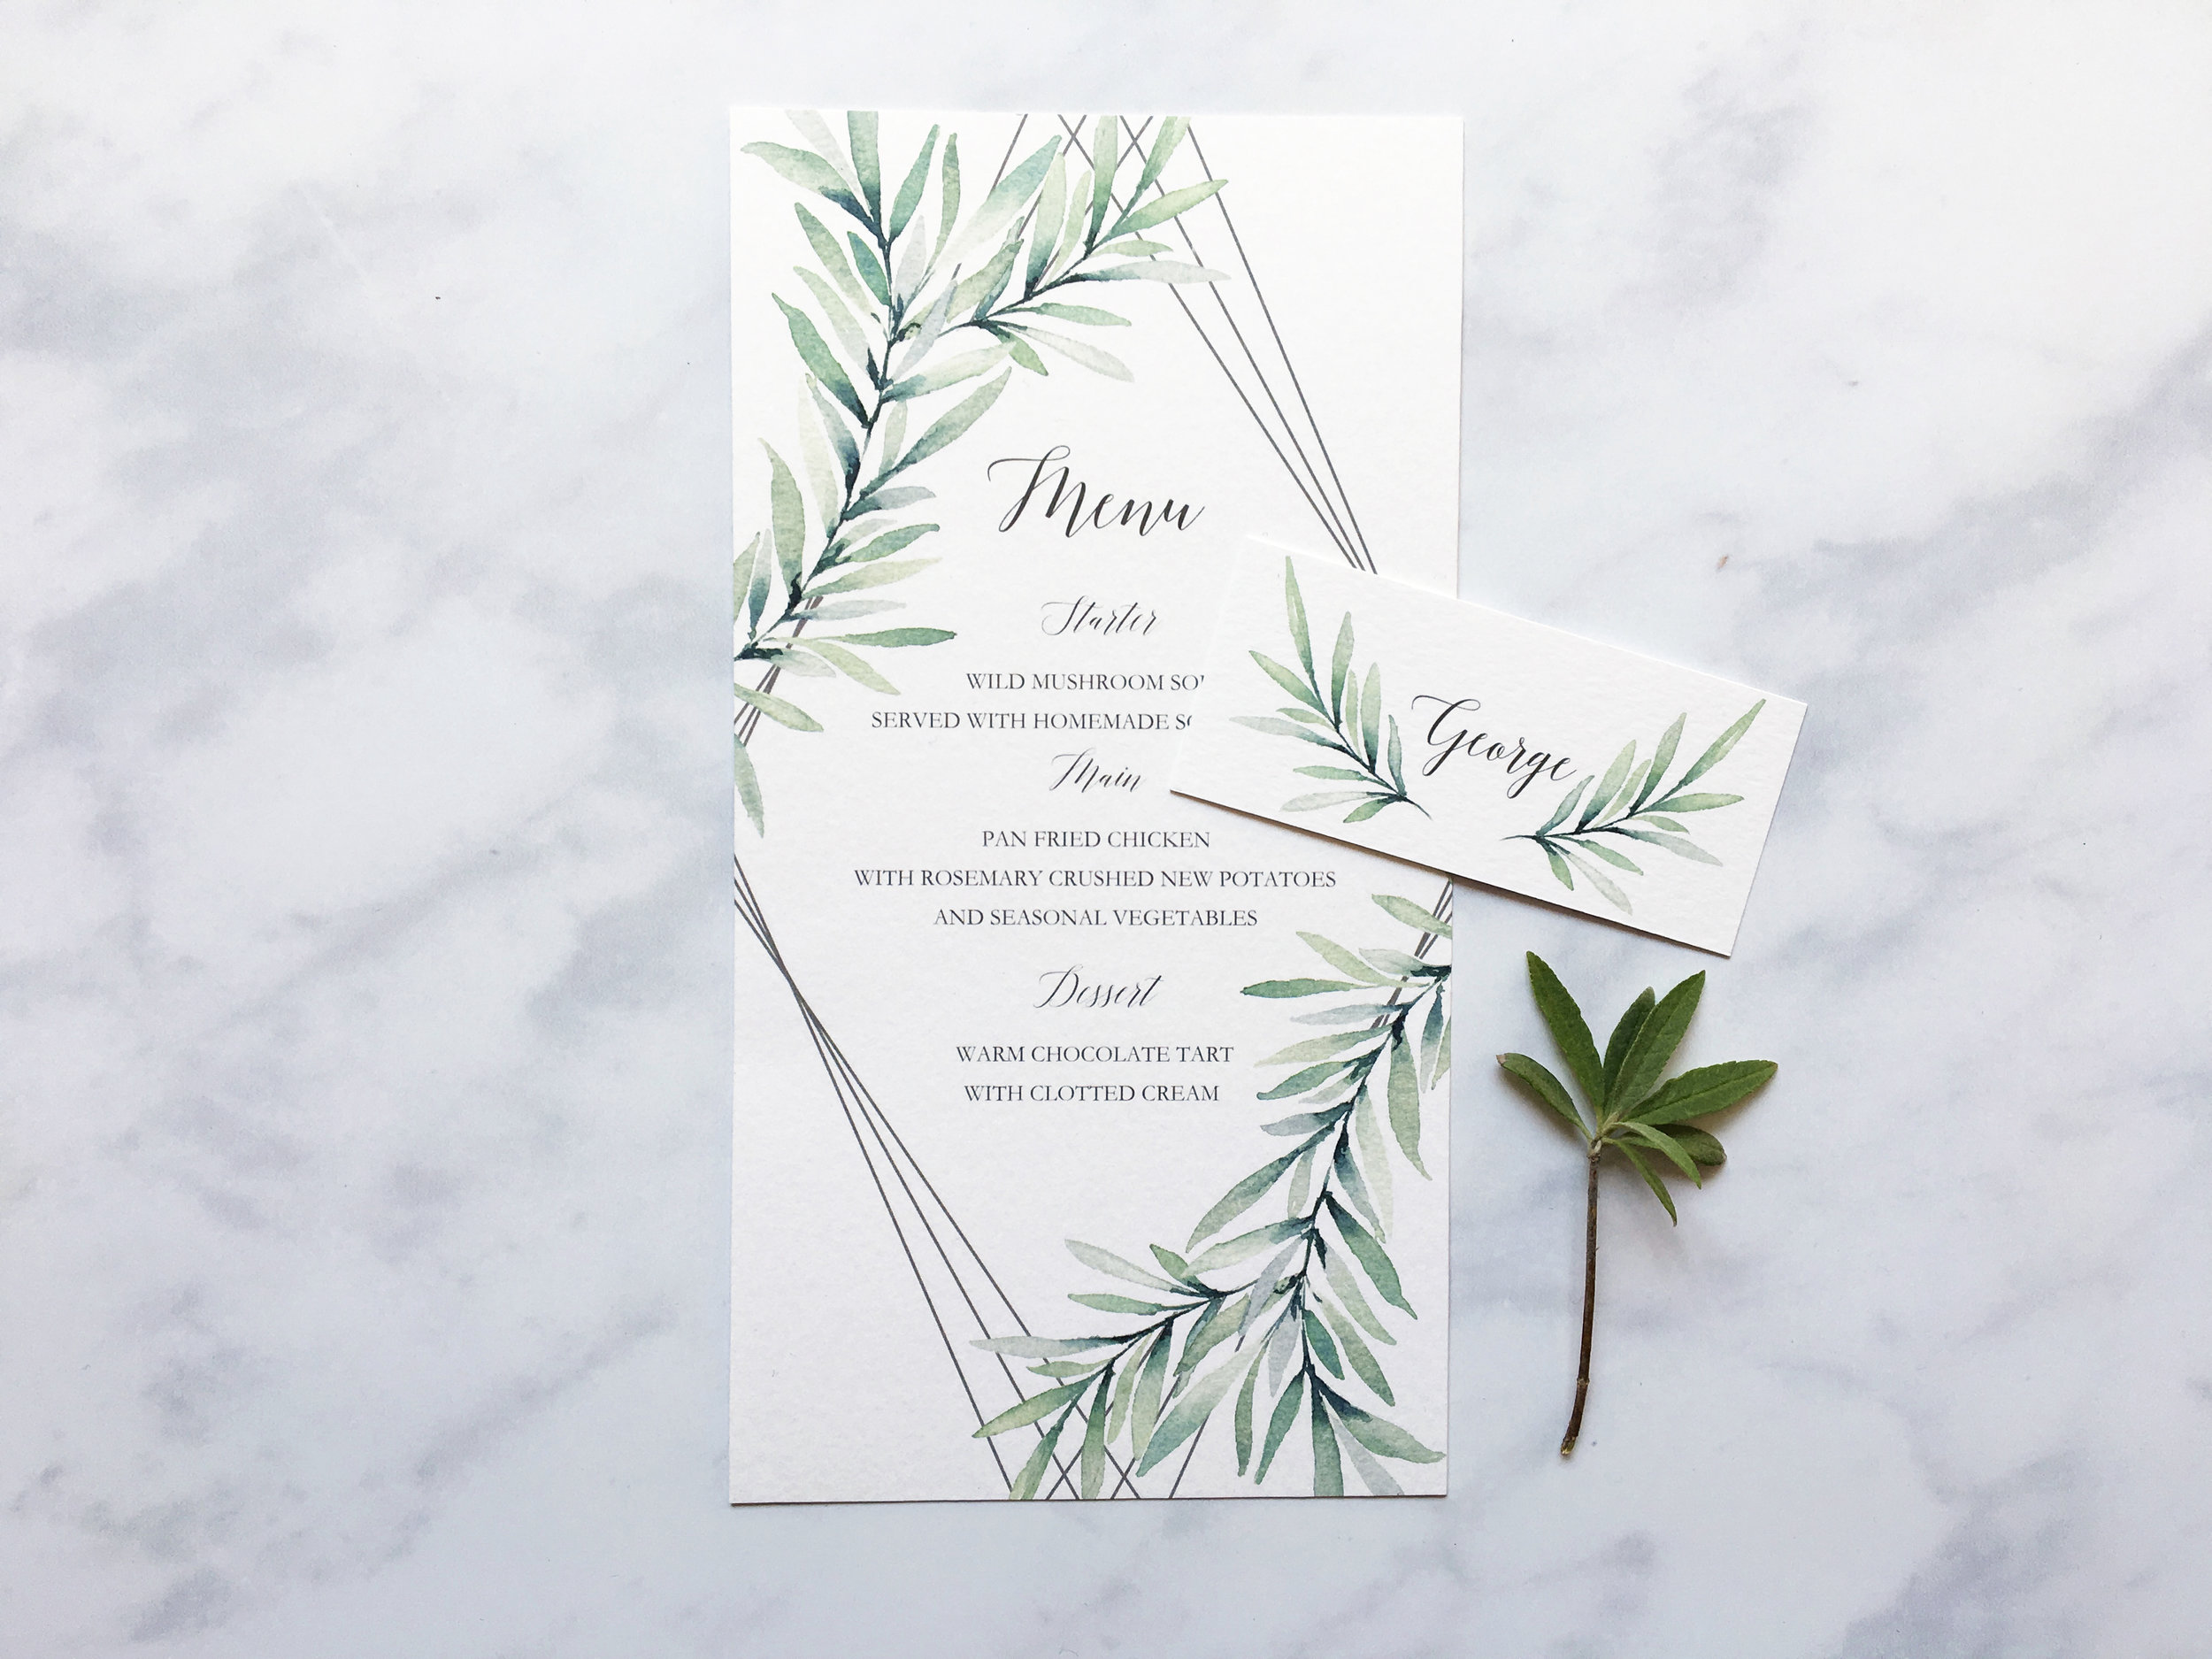 Botaniocal menu and place card.jpg